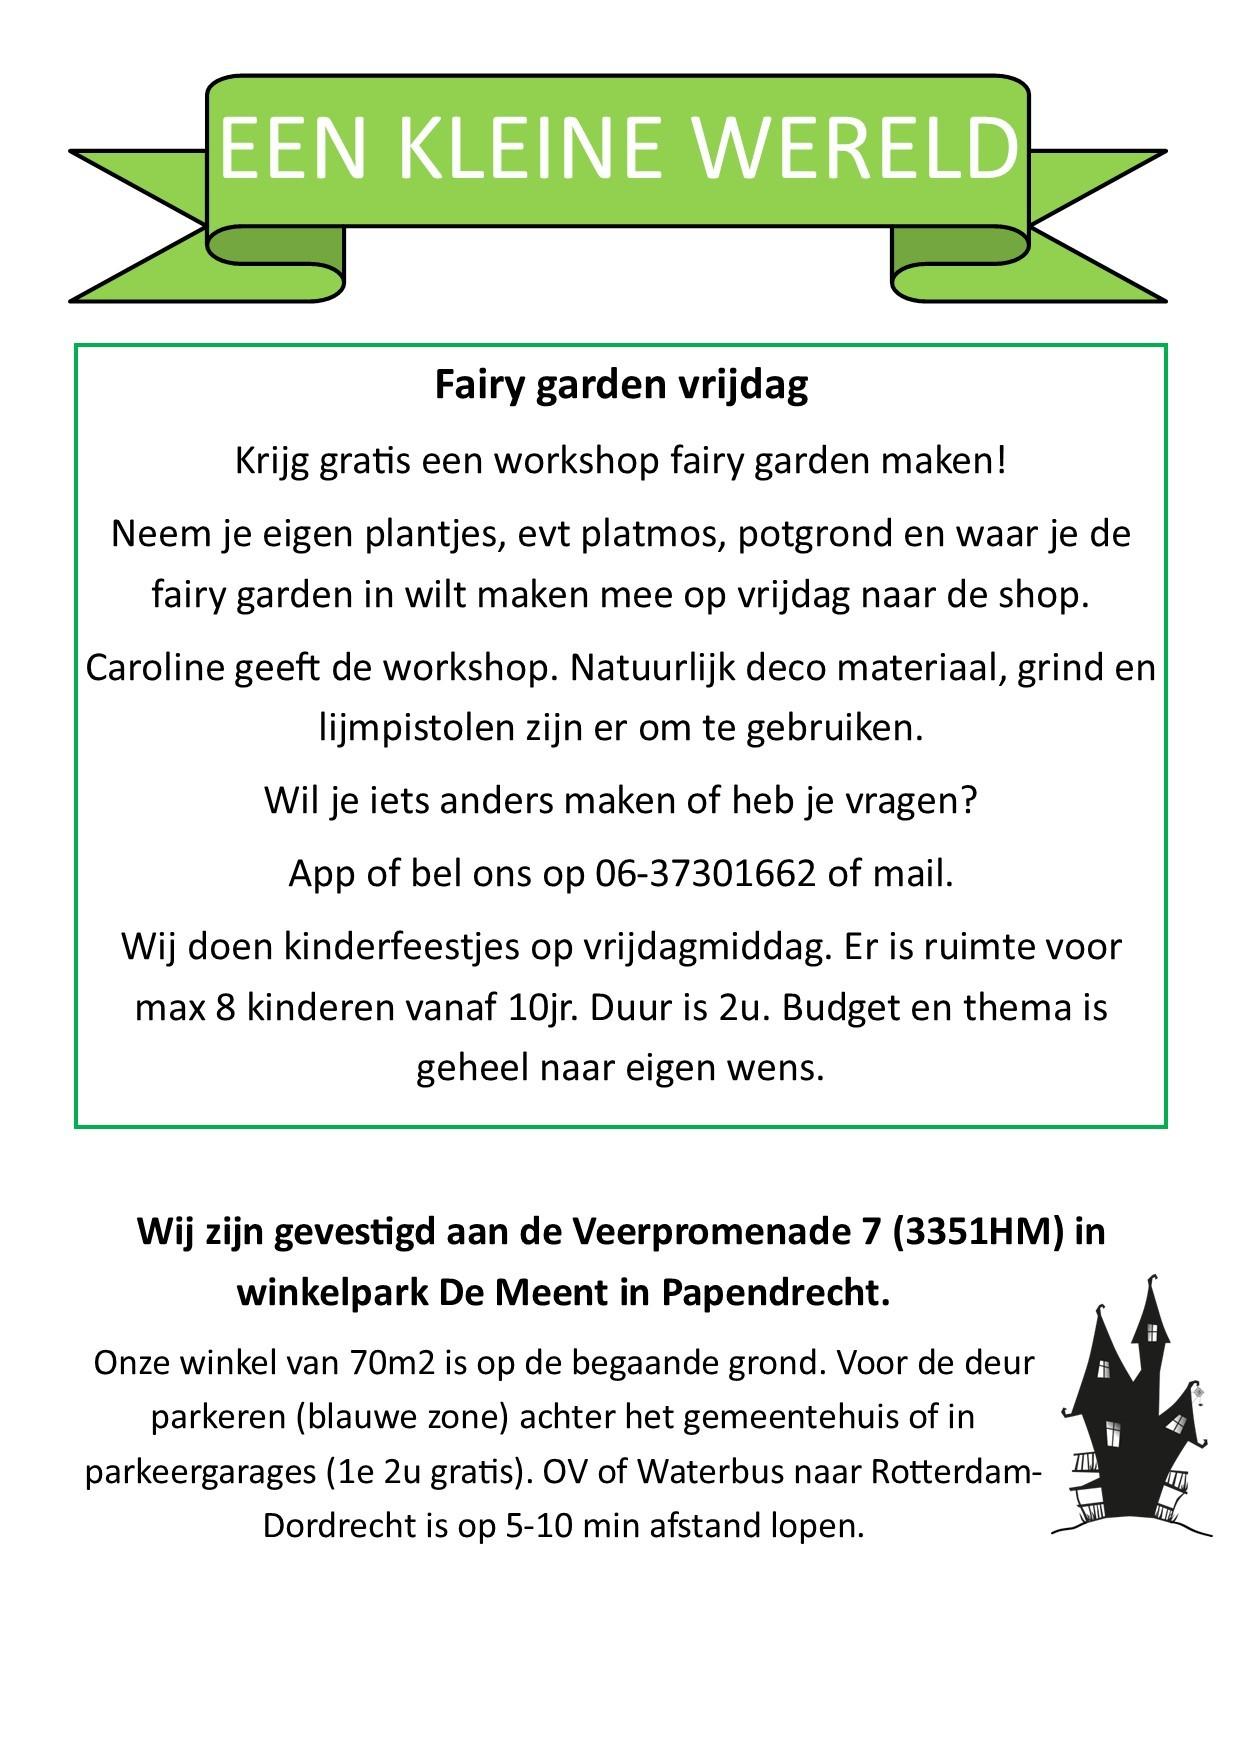 Fairy garden vrijdag